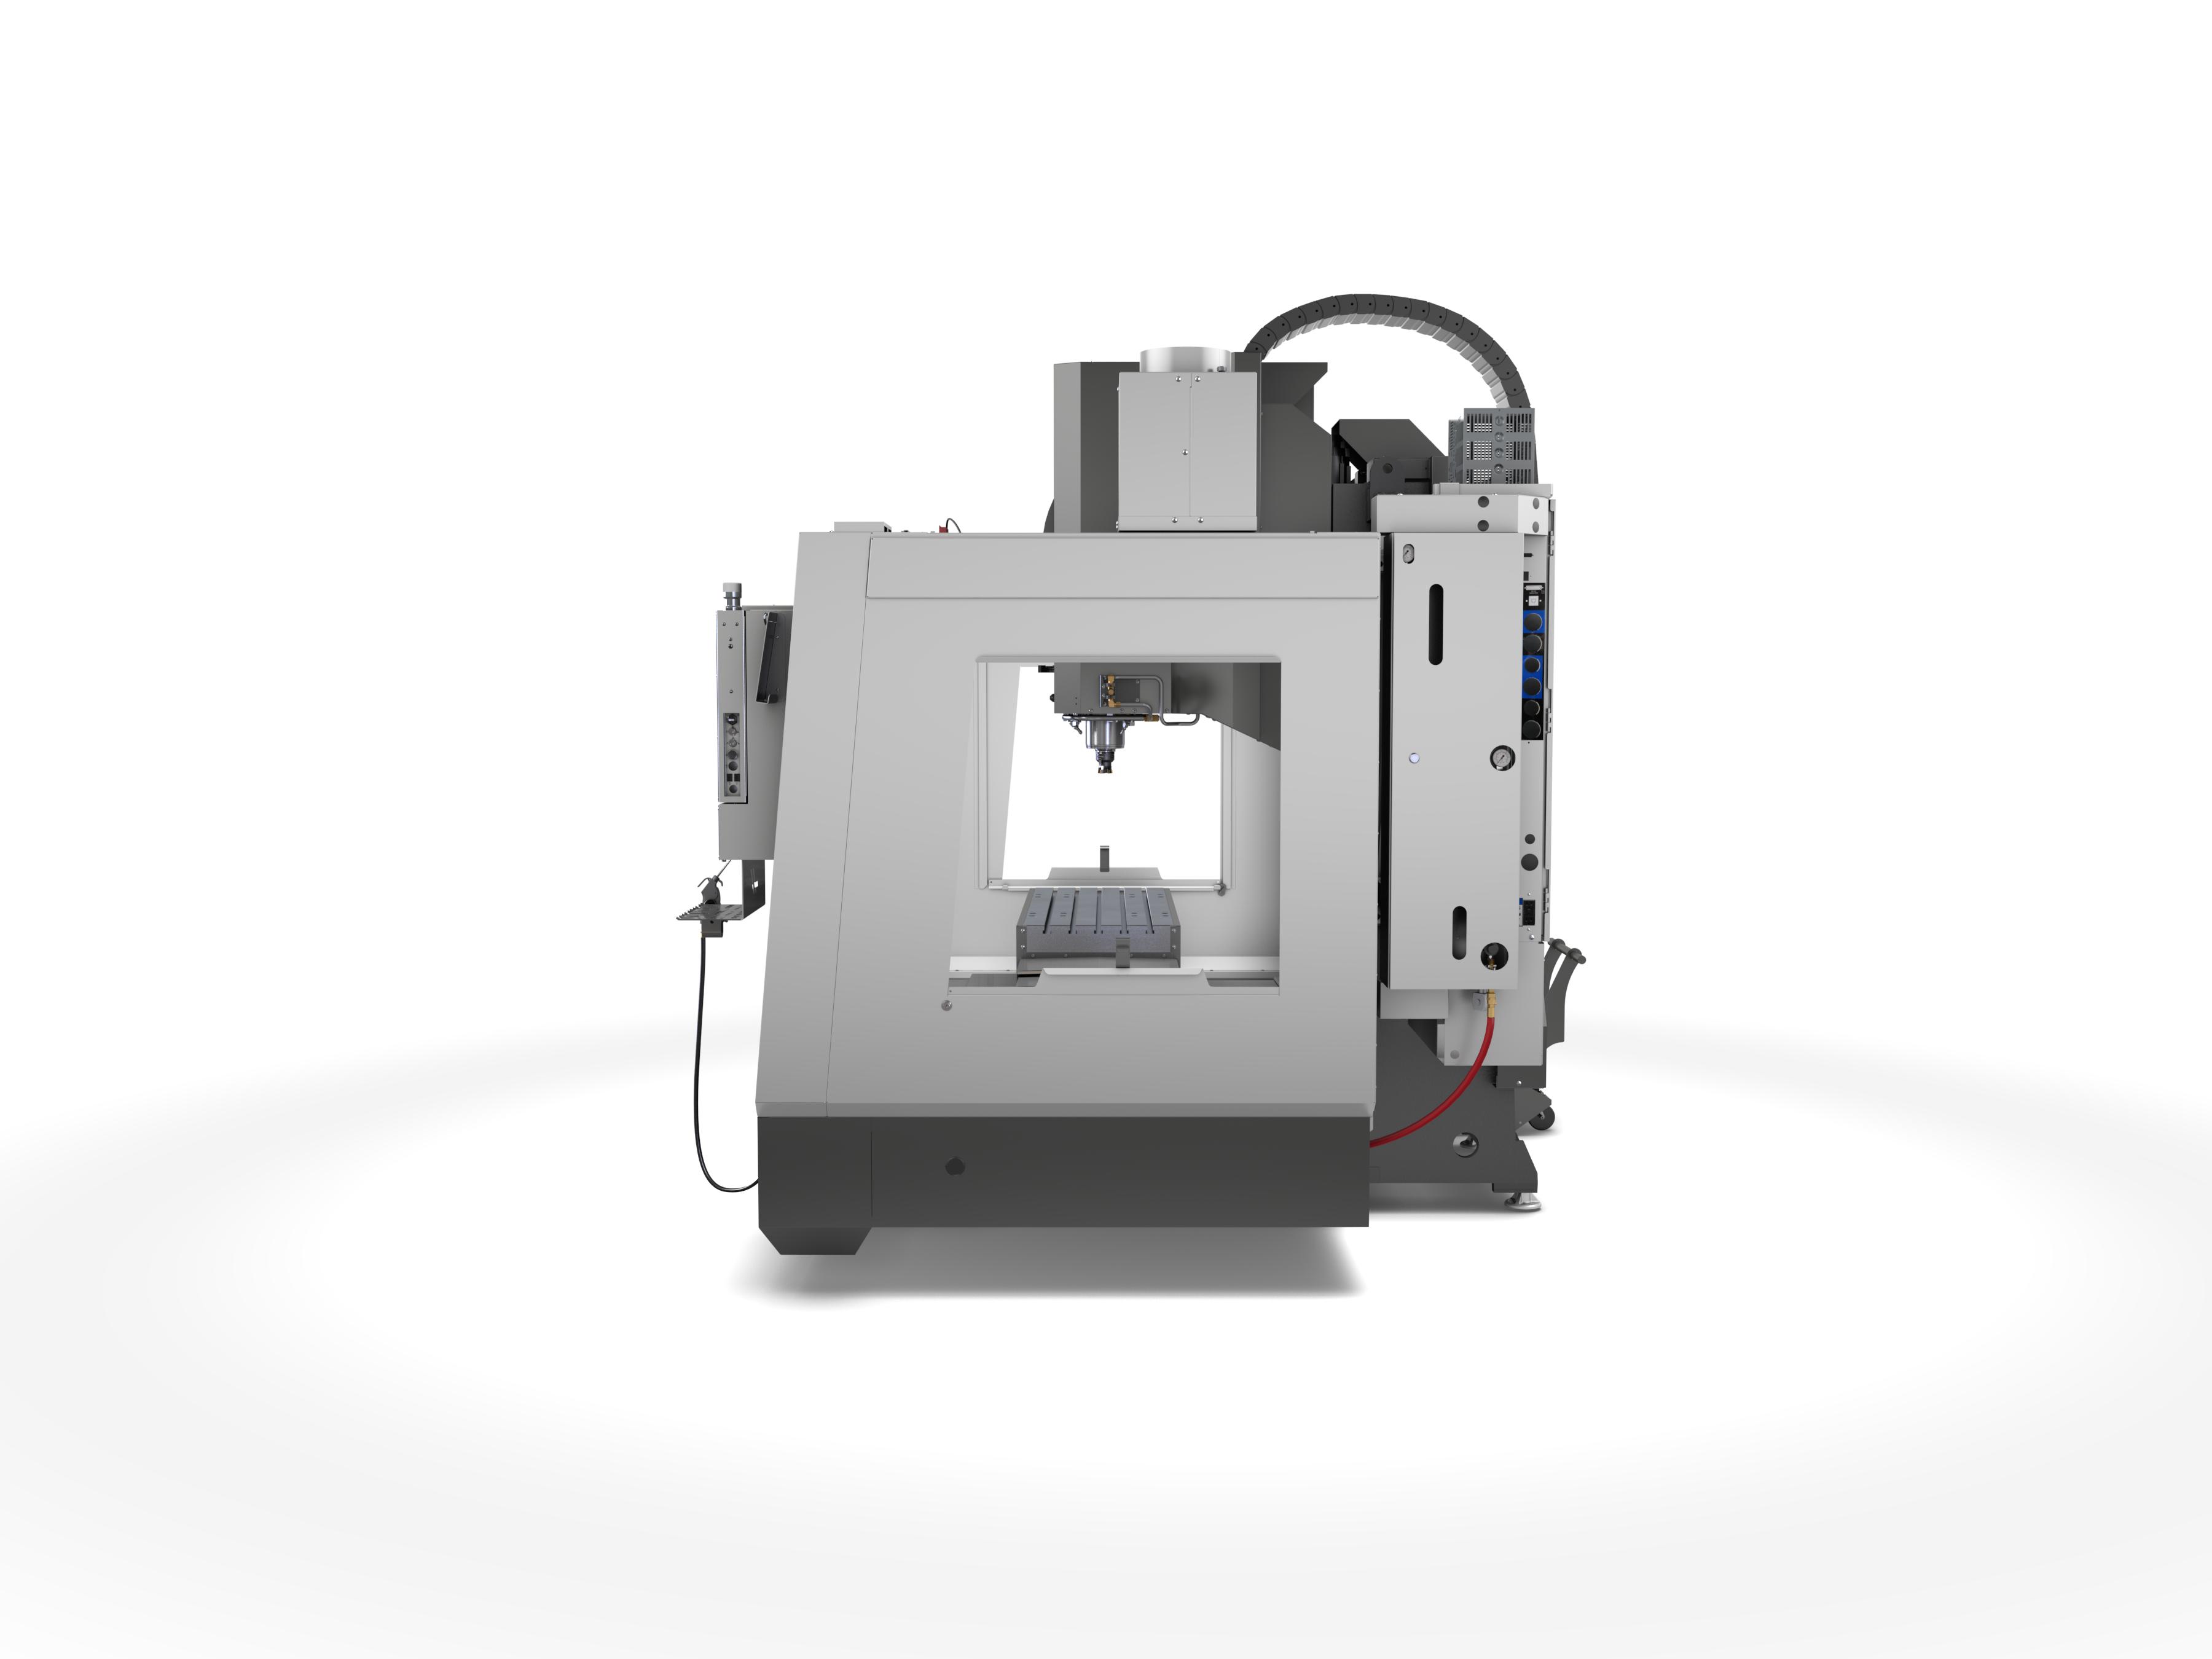 VF-3 | 40-Taper Mill | Vertical Mills – Haas CNC Machines